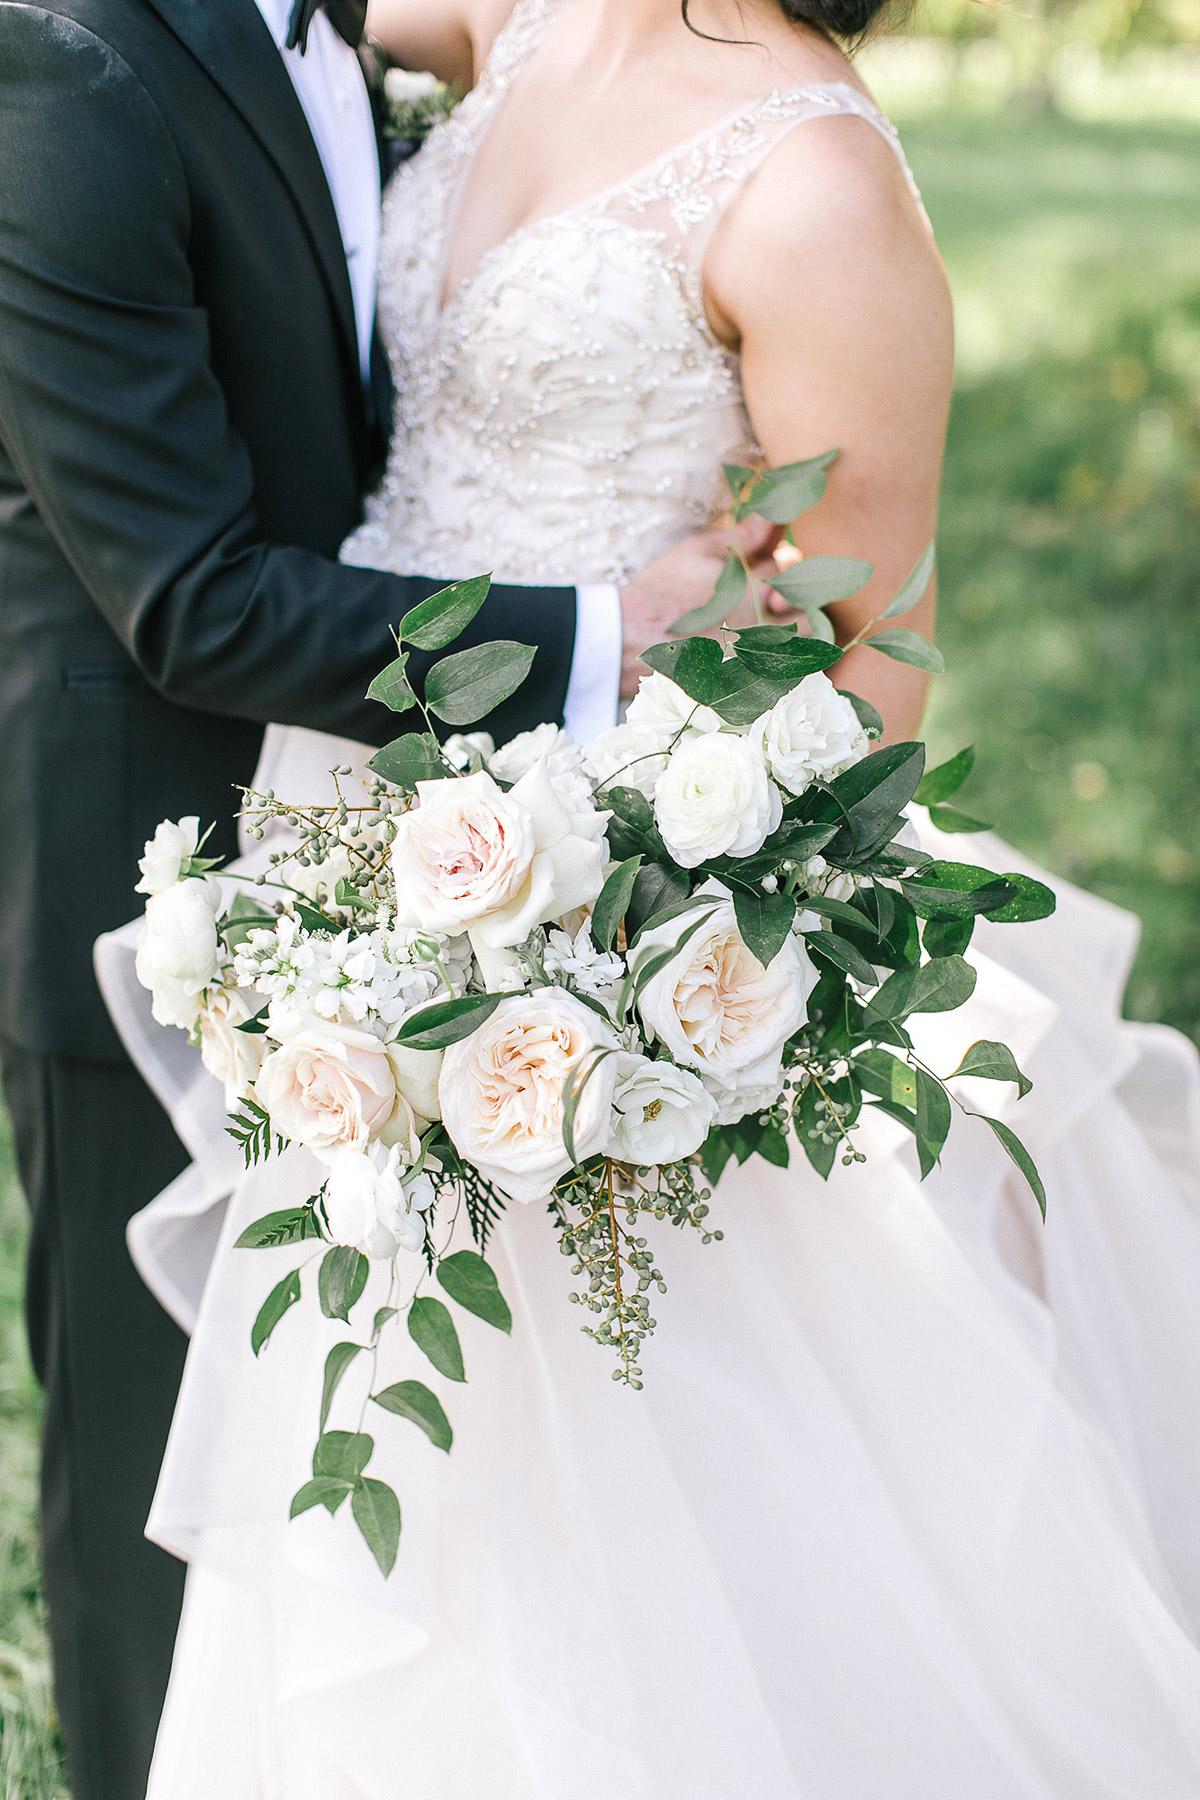 tamara-lockwood-photography-vineyard-bride-swish-list-the-old-courthouse-niagara-on-the-lake-wedding-32.jpg